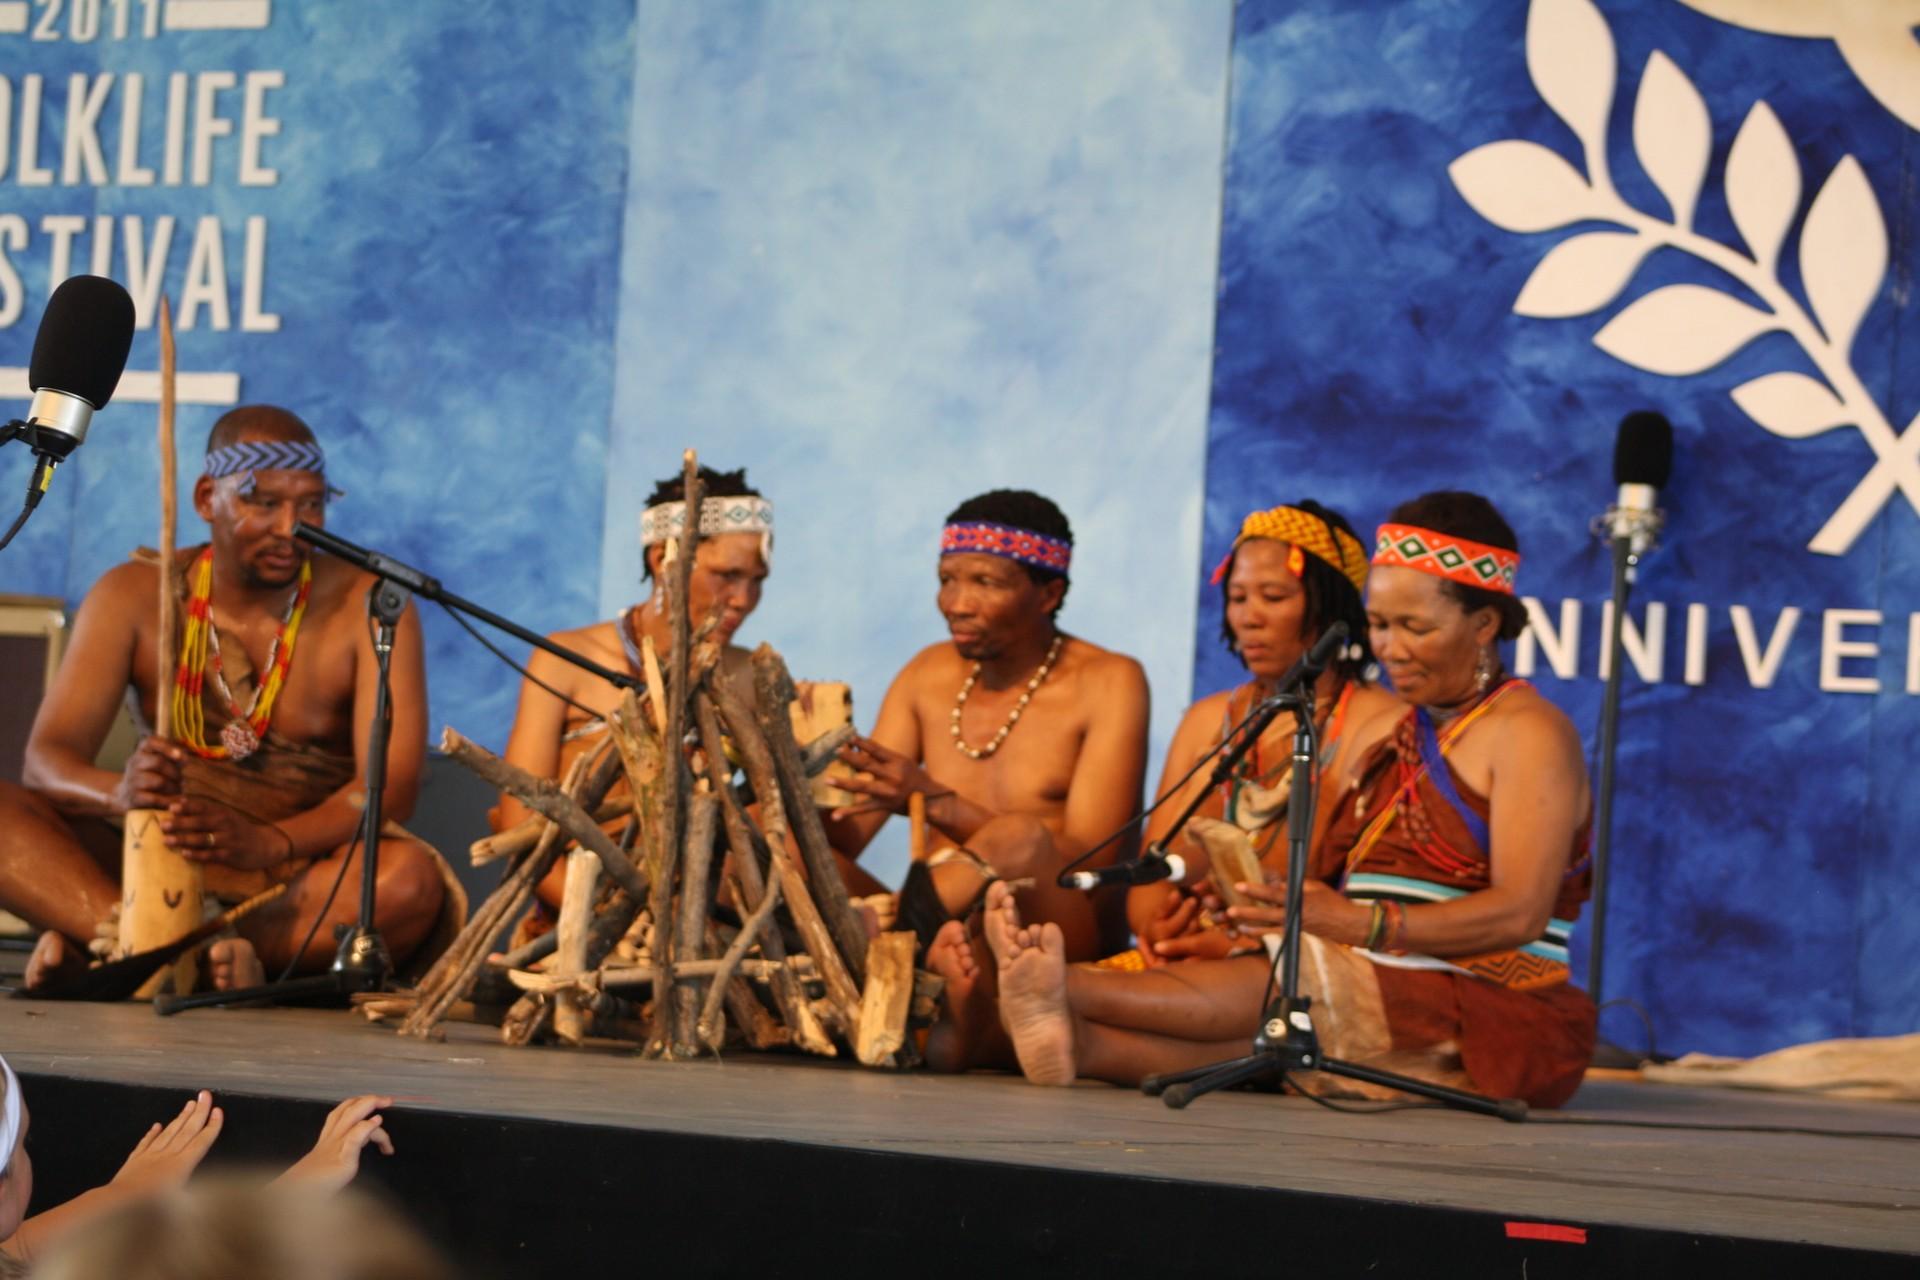 San musicians in Botswana